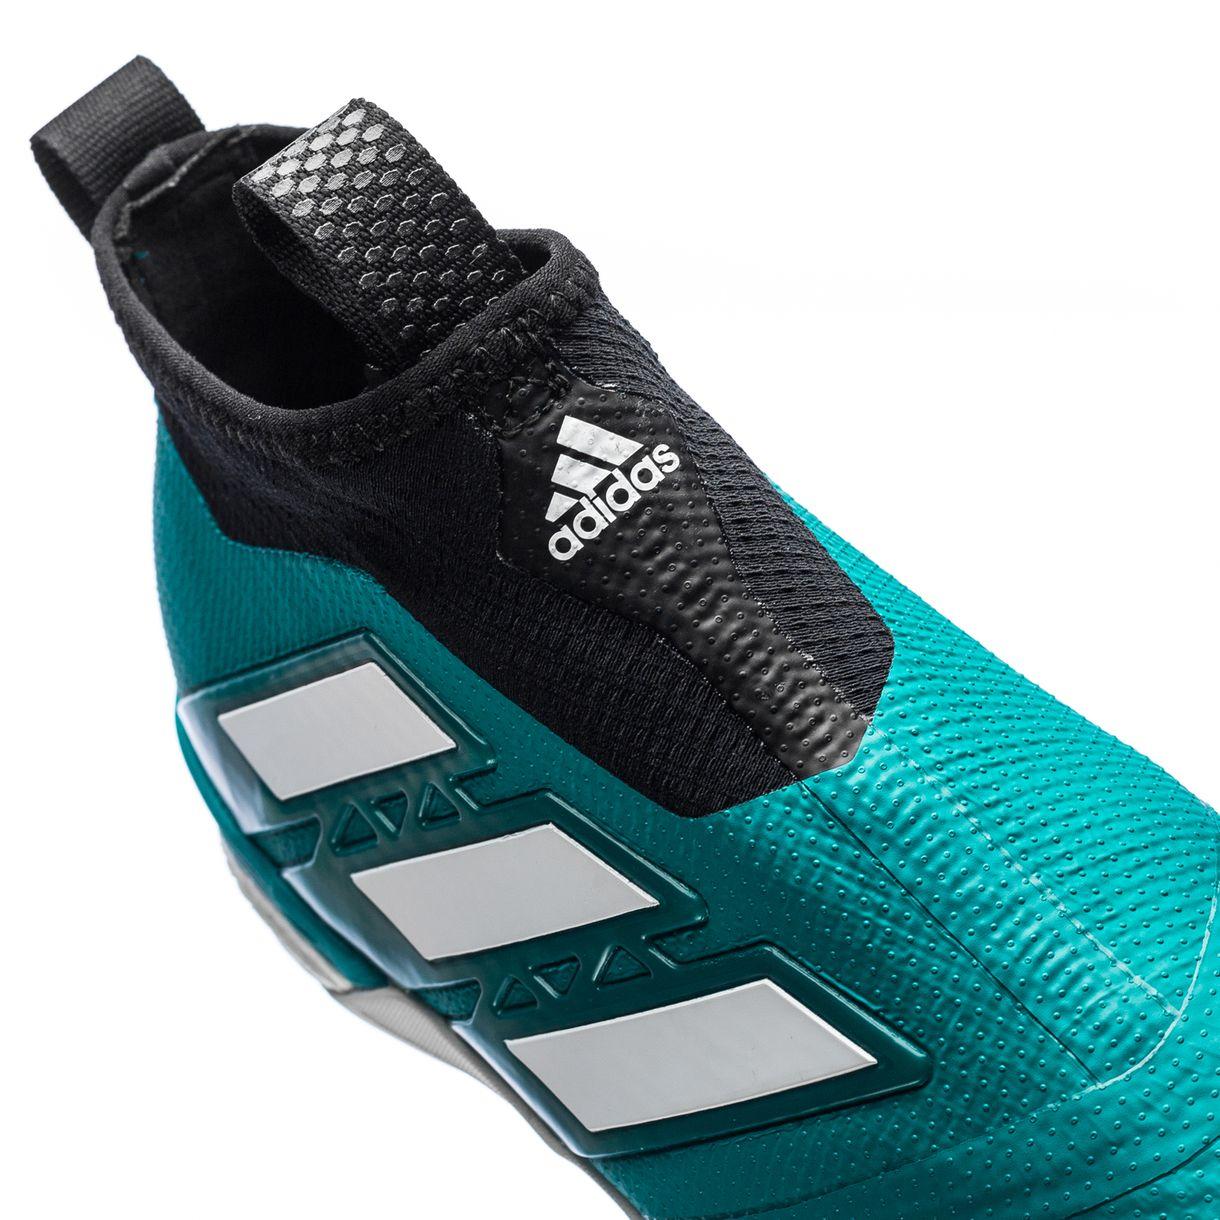 save off efd56 5f92b Adidas ACE Tango 17+ PureControl Boost TF EQT Green Pack ...